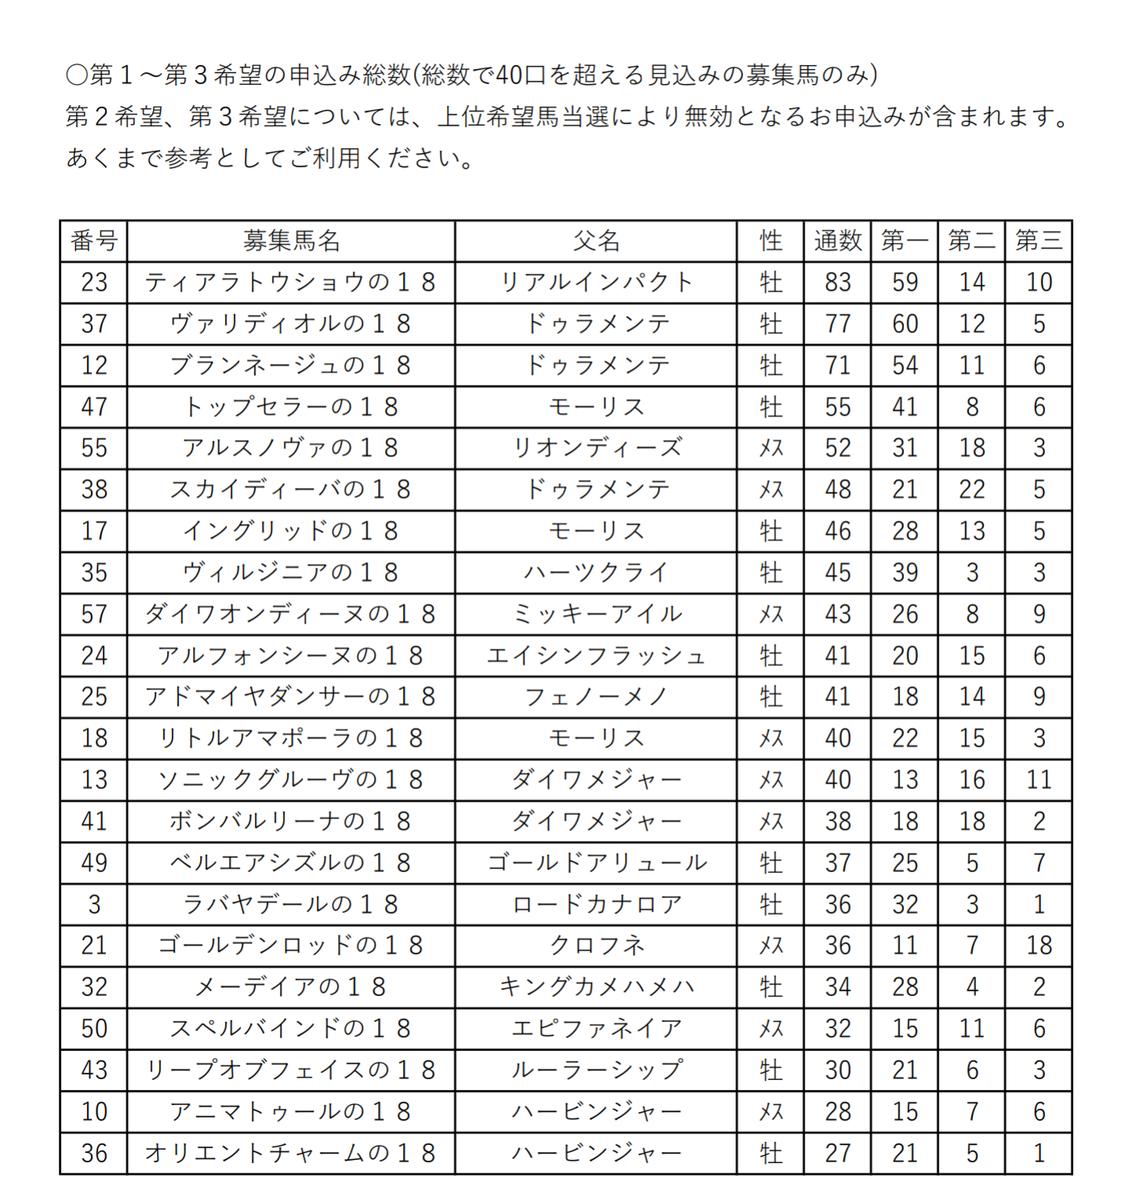 f:id:kurokiri-G1:20190627204212p:plain